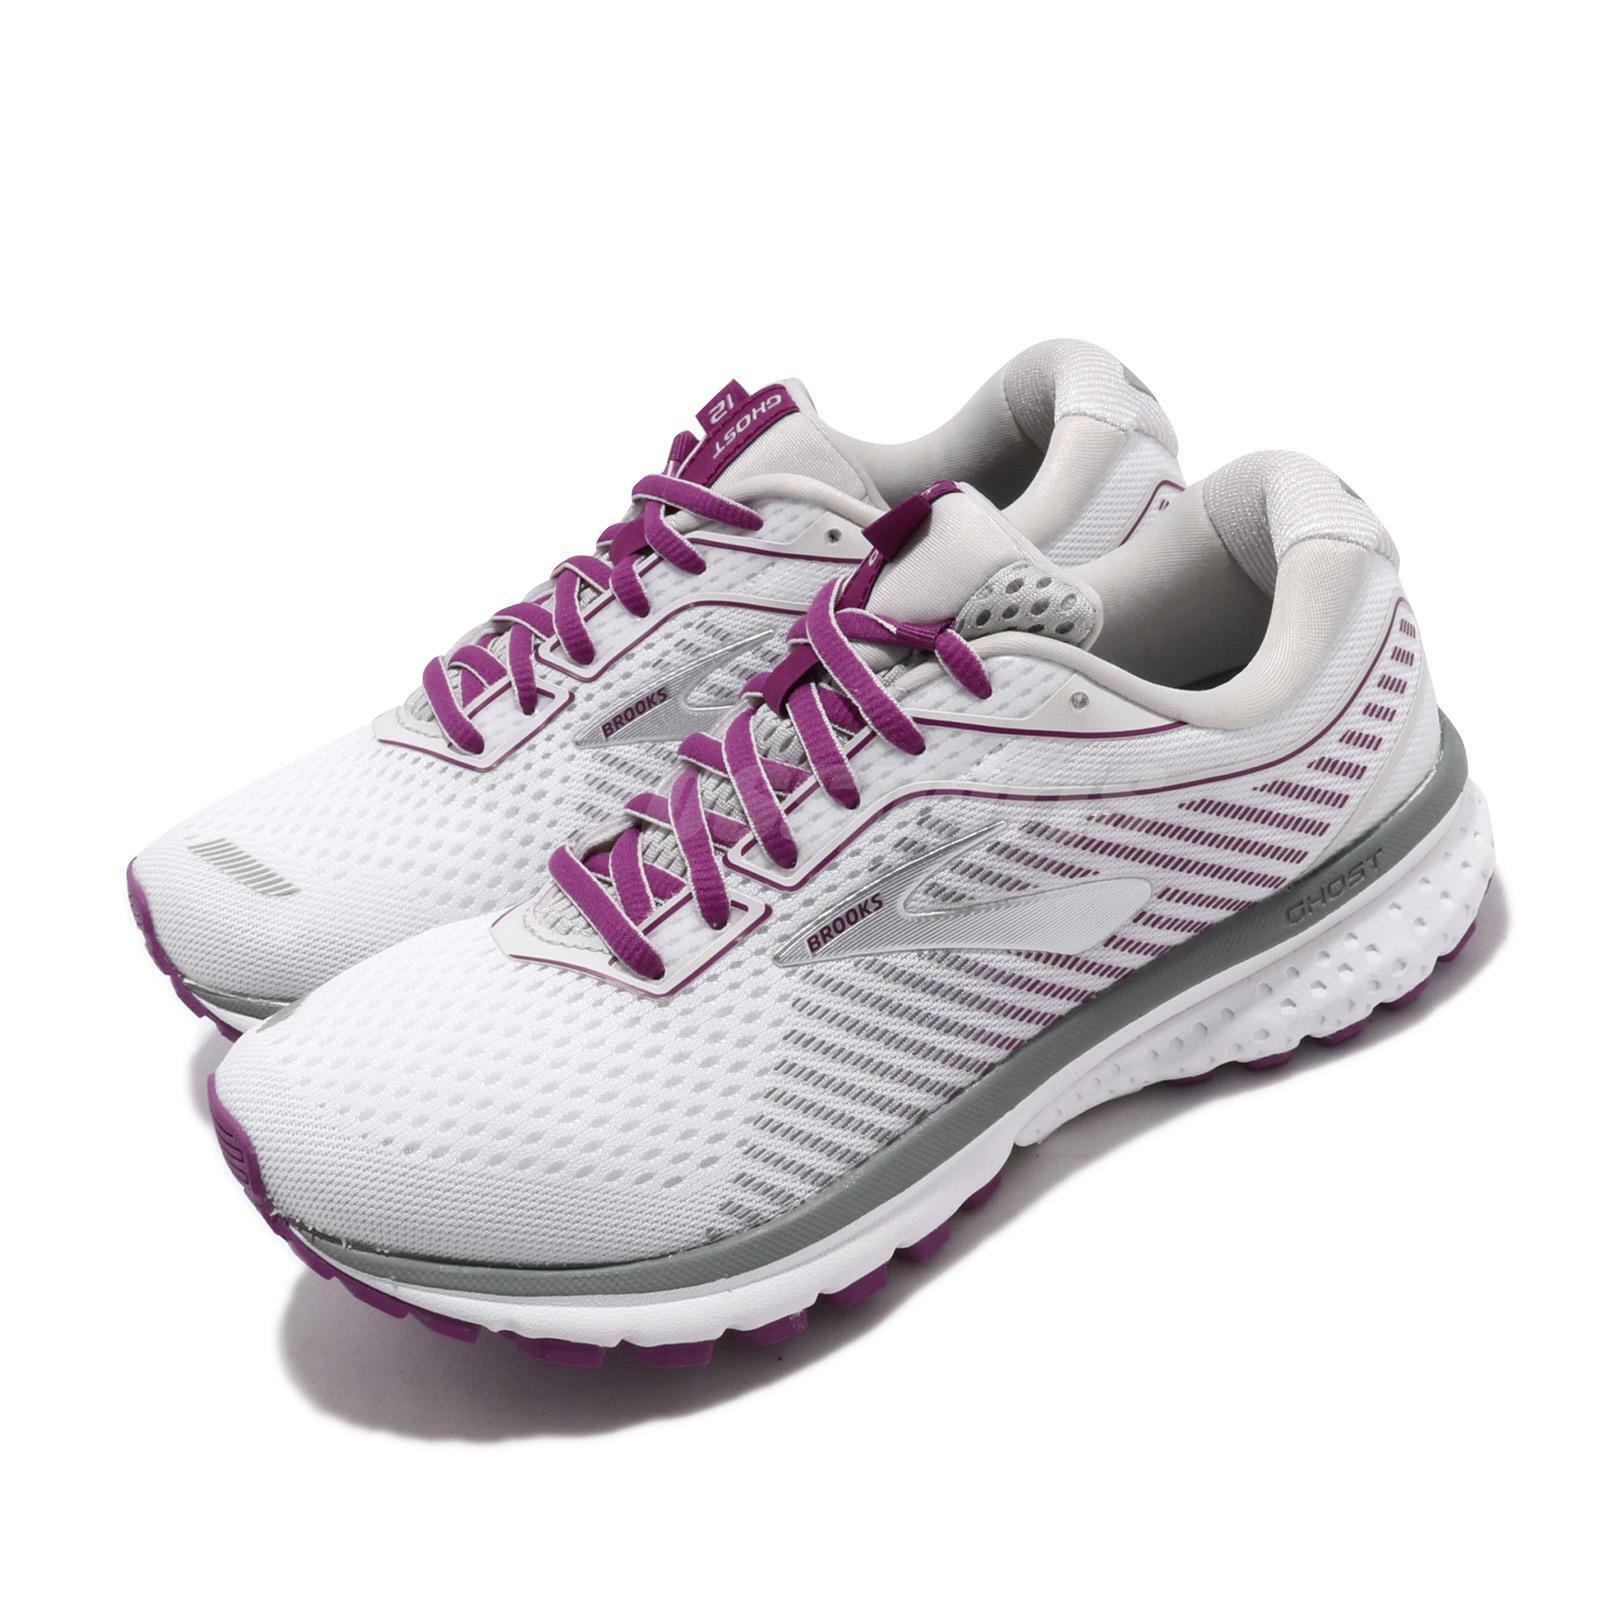 Brooks Ghost 12 D Ancho blancoo púrpuraa Mujer Running Zapatos TENIS 120305 1D